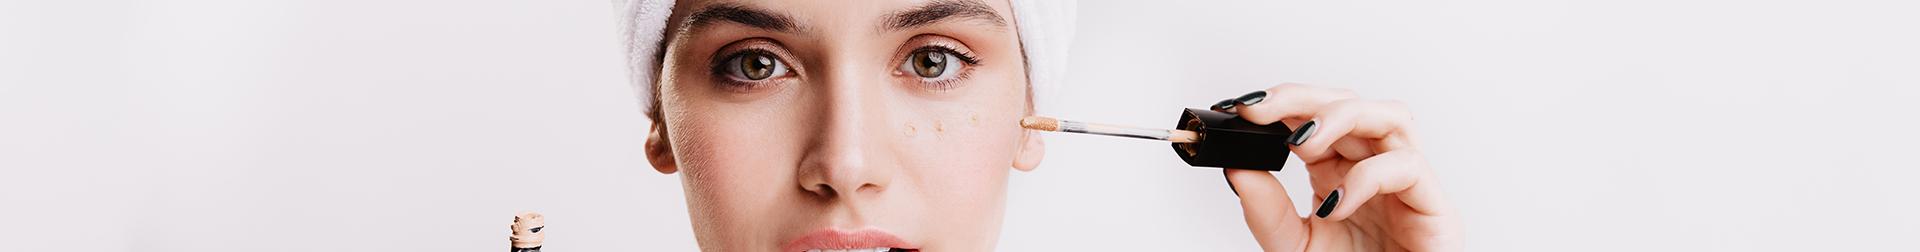 Makeup Products | Eye Primer - Buy Eye Primer | AromaCraze